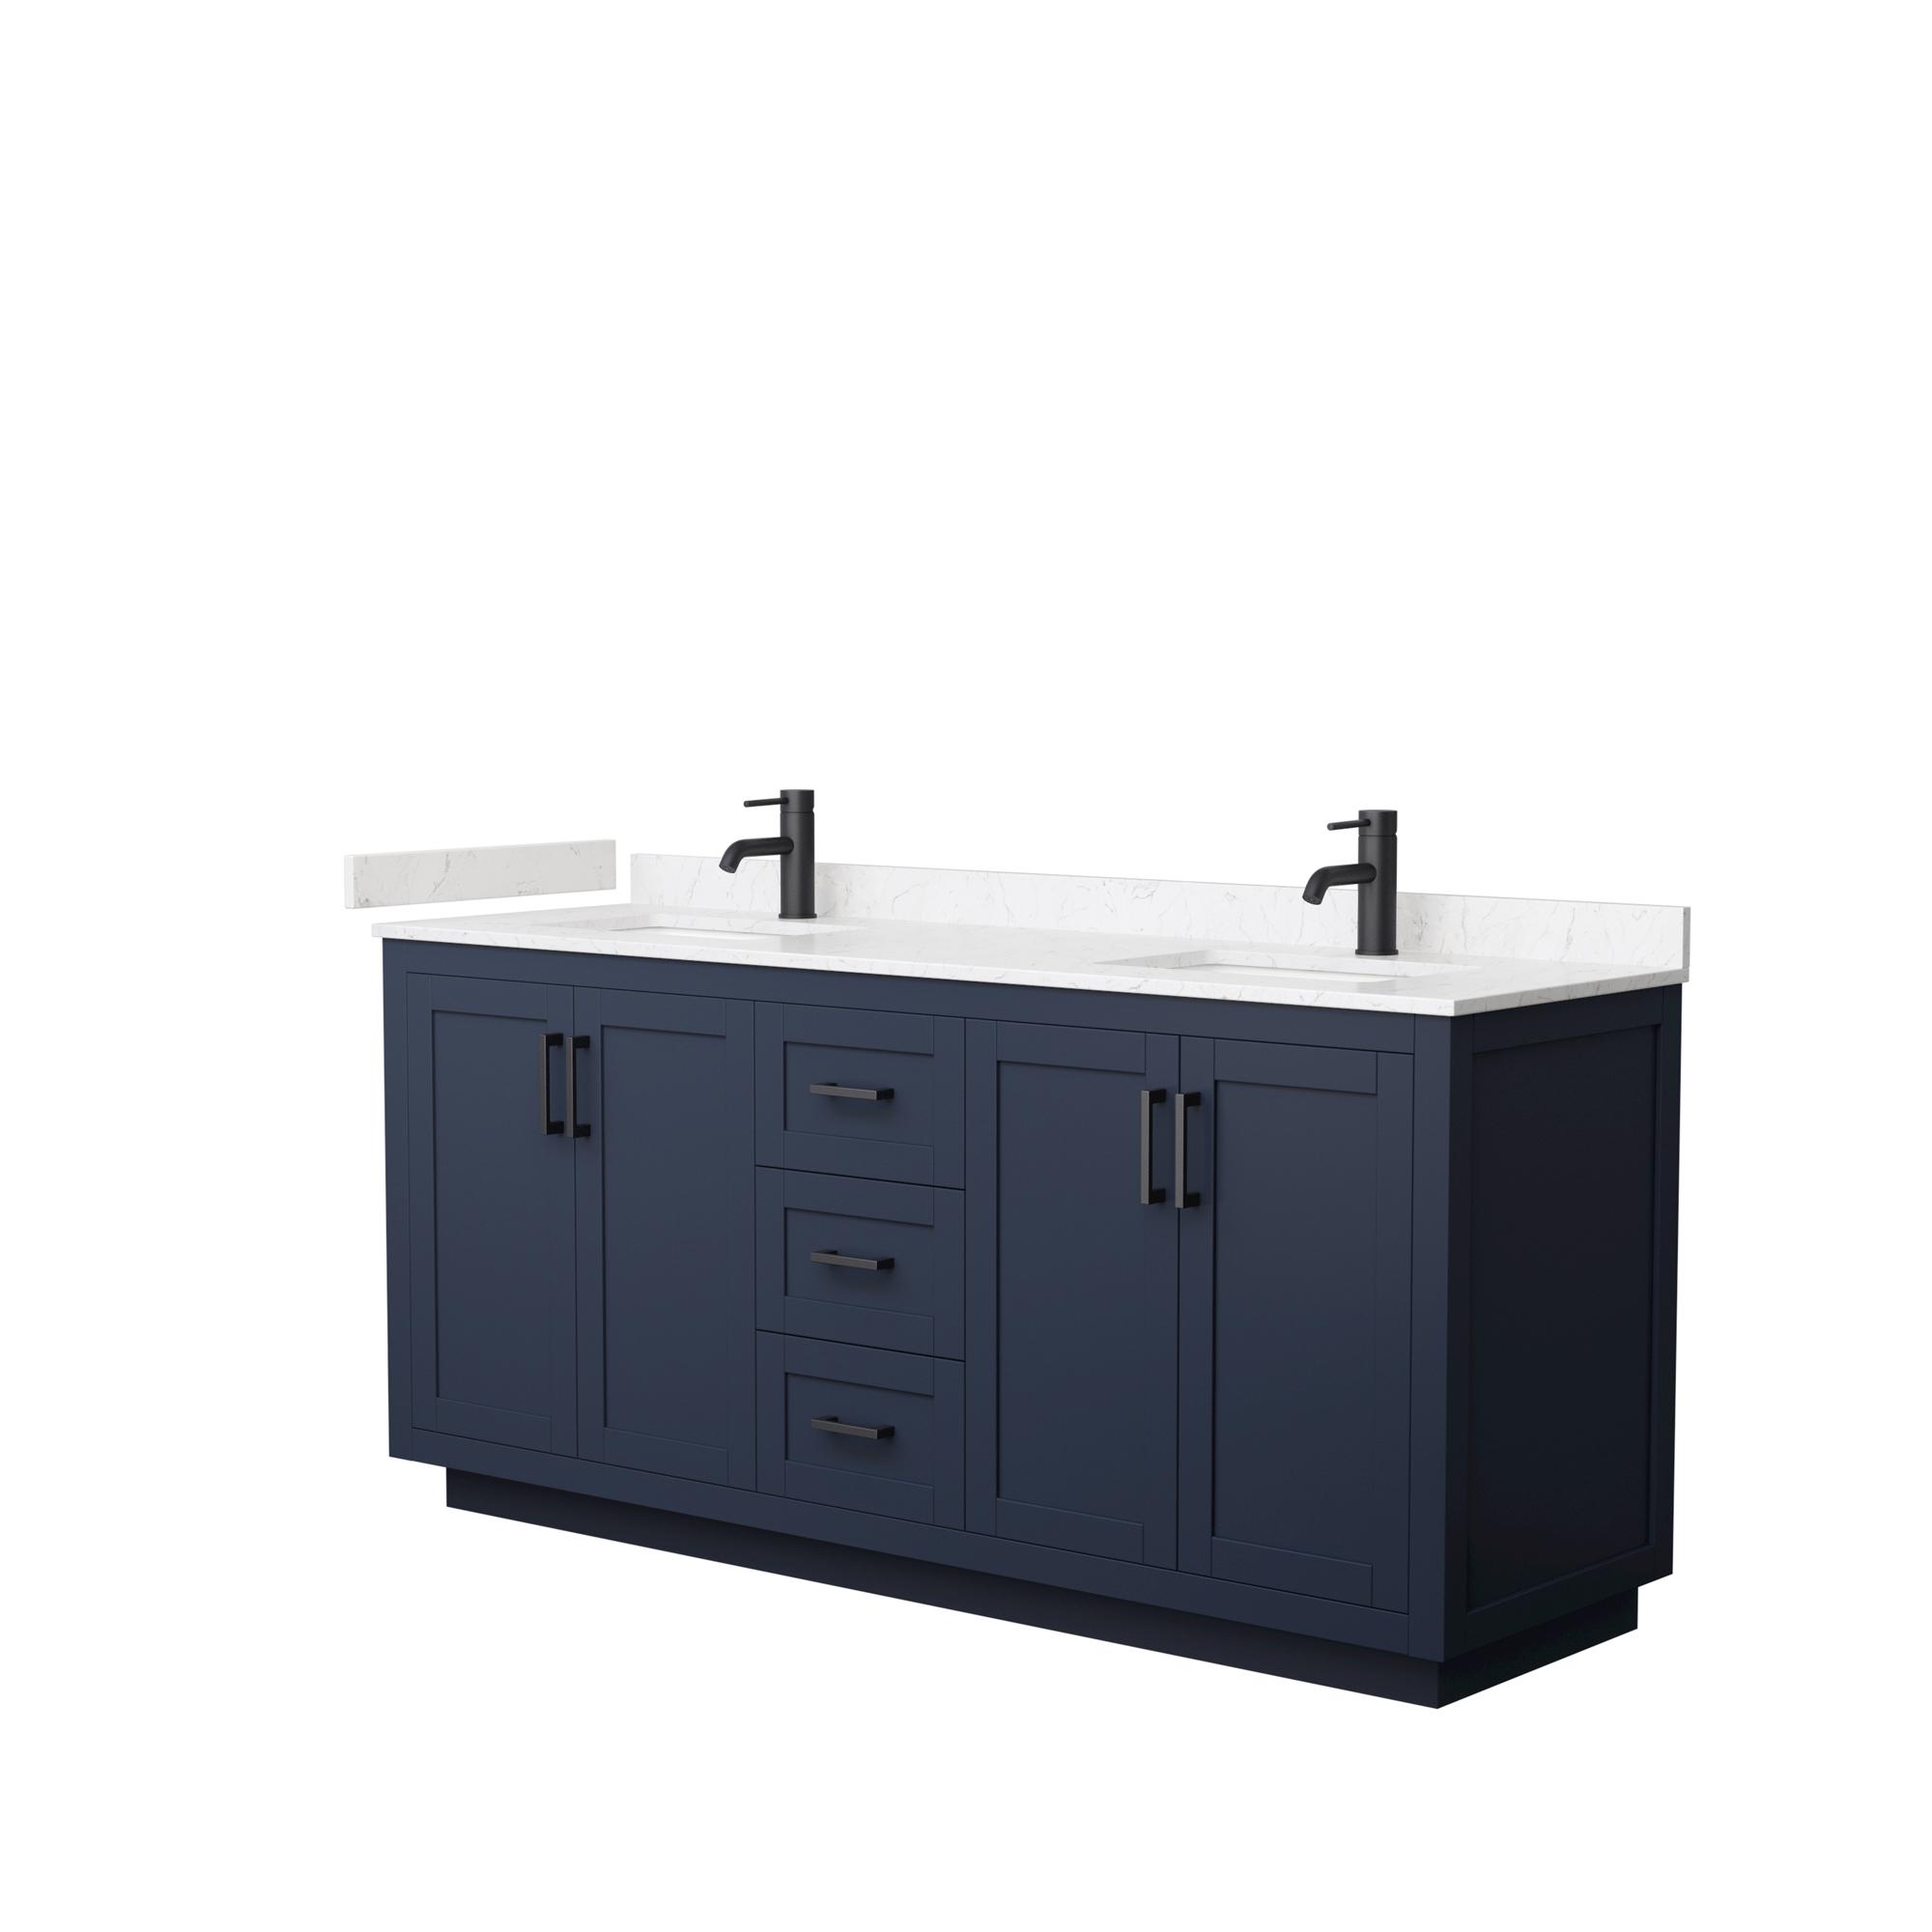 "72"" Double Bathroom Vanity in Dark Blue, Light-Vein Carrara Cultured Marble Countertop, Undermount Square Sinks, Matte Black Trim"